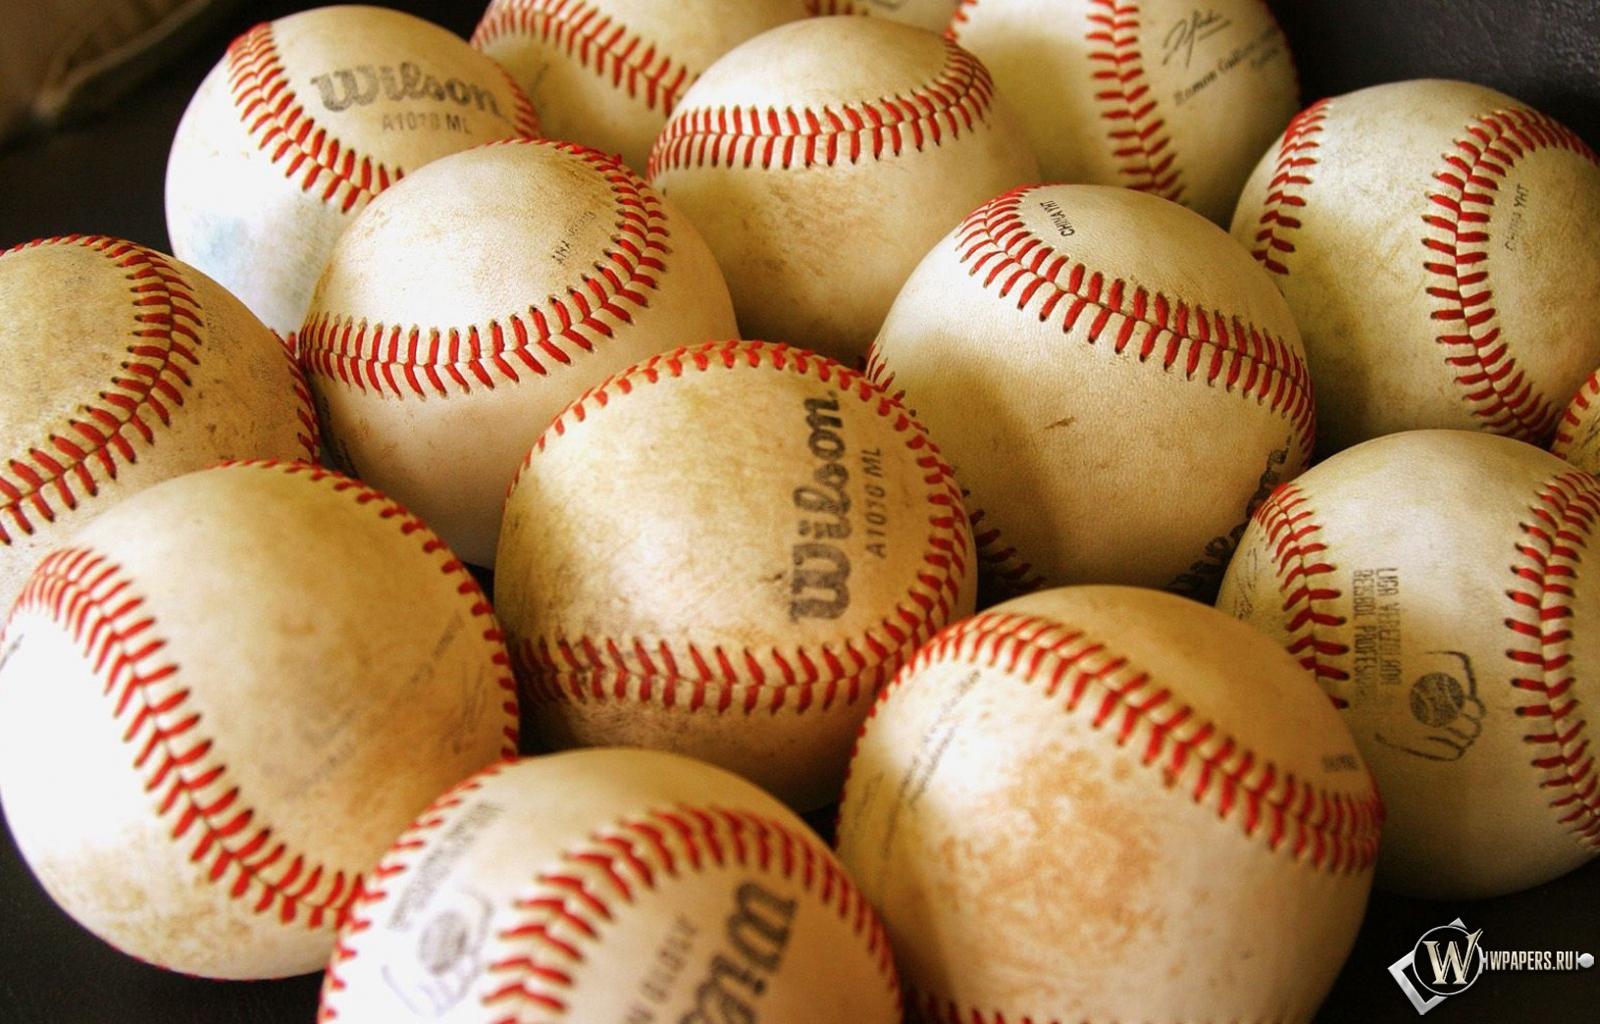 Обои бейсбол спорт бейсбол 1600x1024